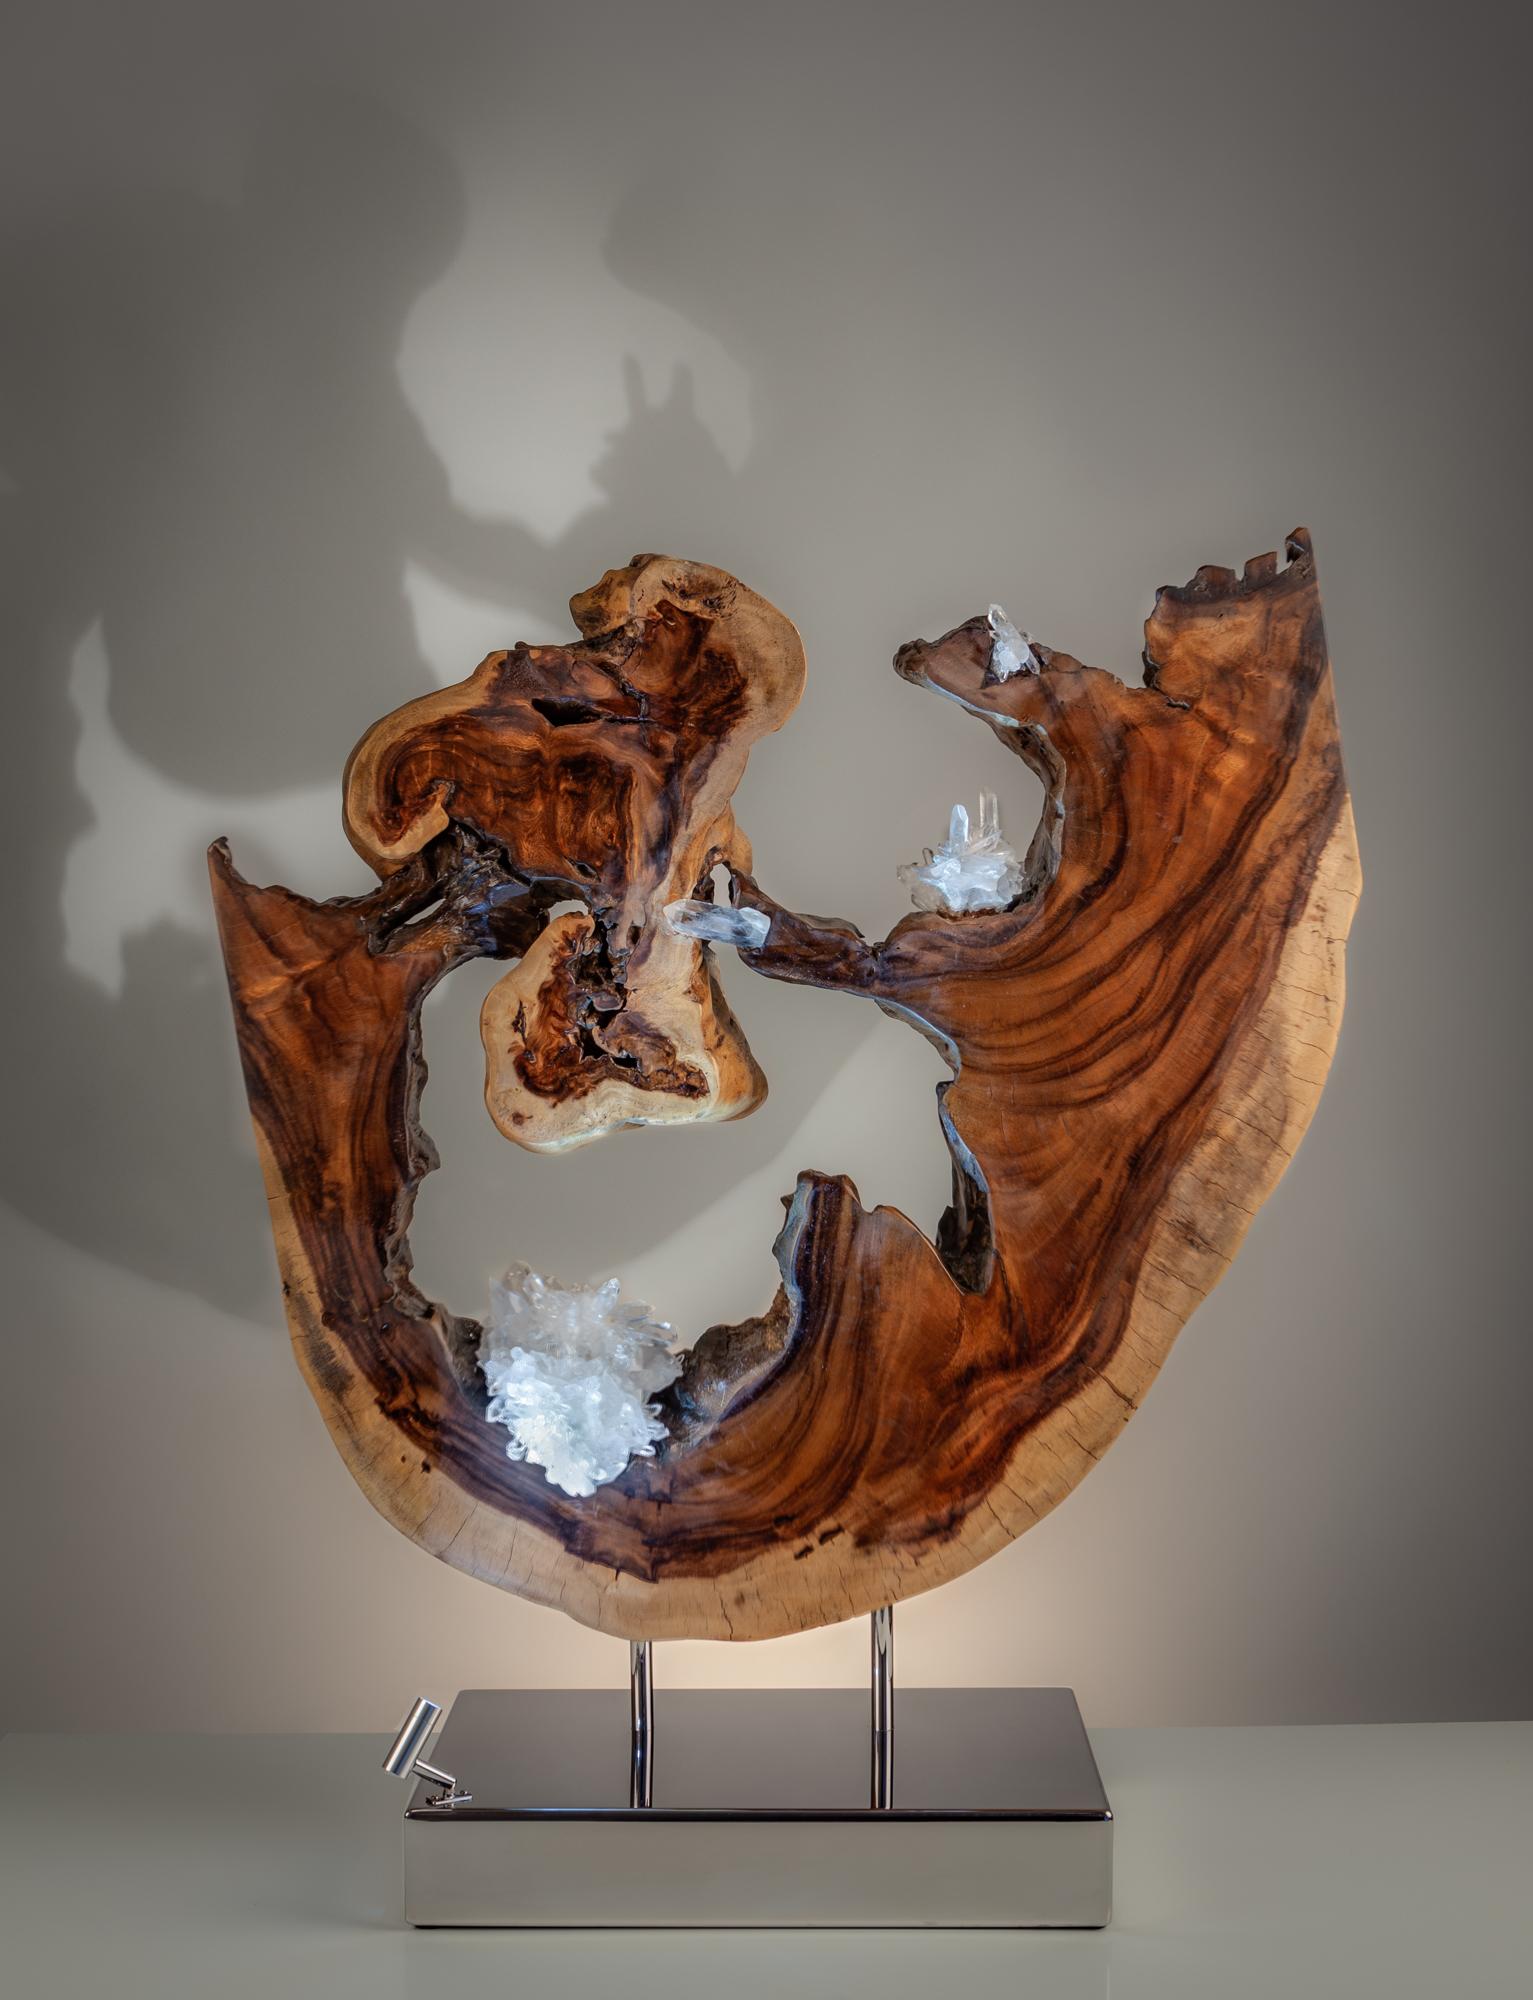 Facets of Love by sculptor Dorit Schwartz (36x31x12 inches)